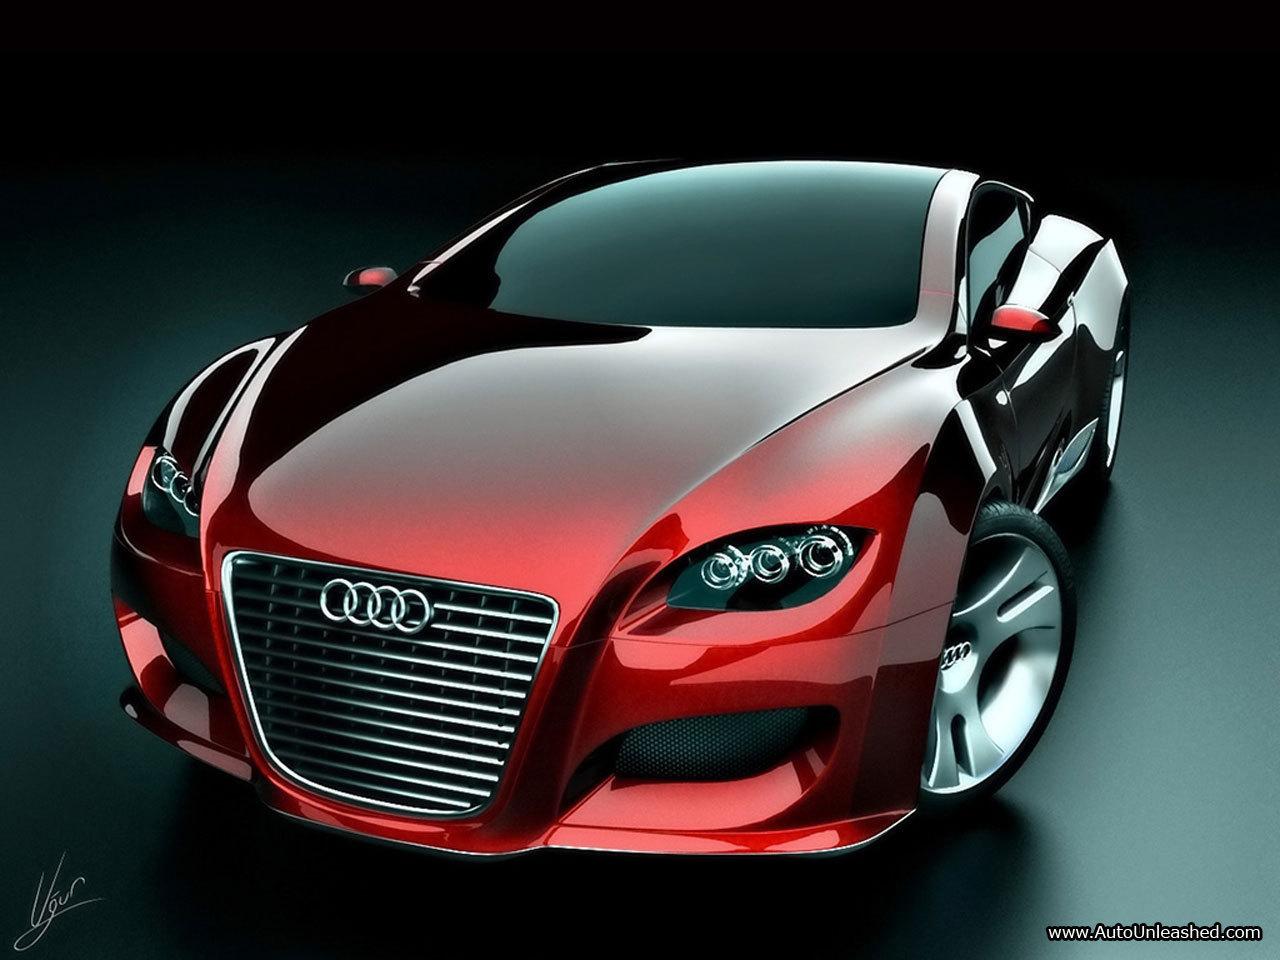 http://1.bp.blogspot.com/-F6vyvNfY4i8/ULiTBwaPeuI/AAAAAAAACRA/FCPvAHrg1nw/s1600/audi+cars+wallpapers-1.jpg